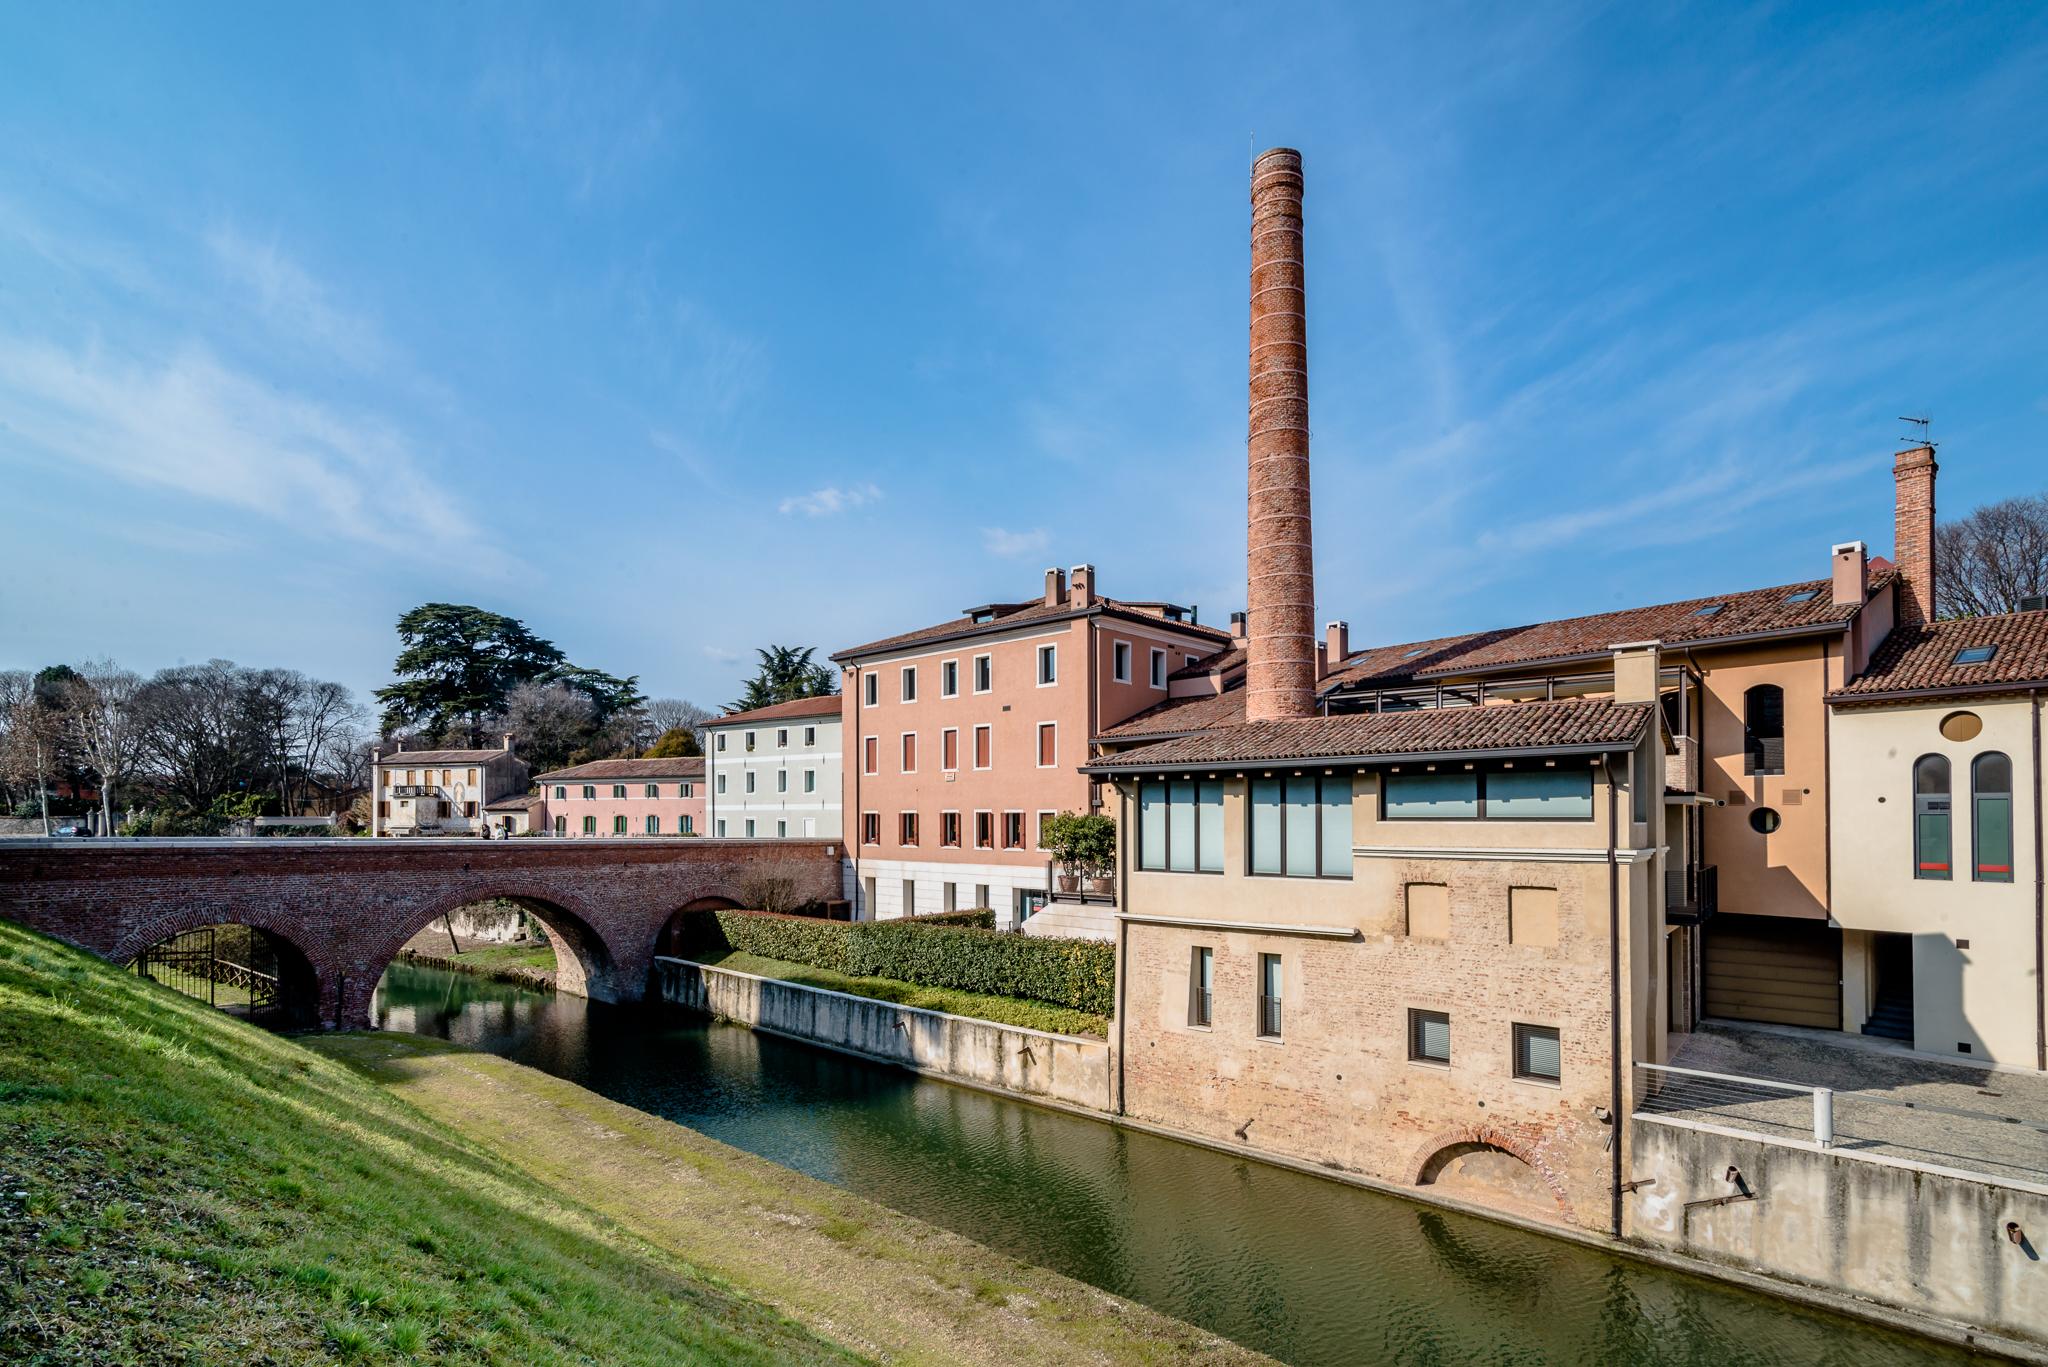 View from Porta Bassano